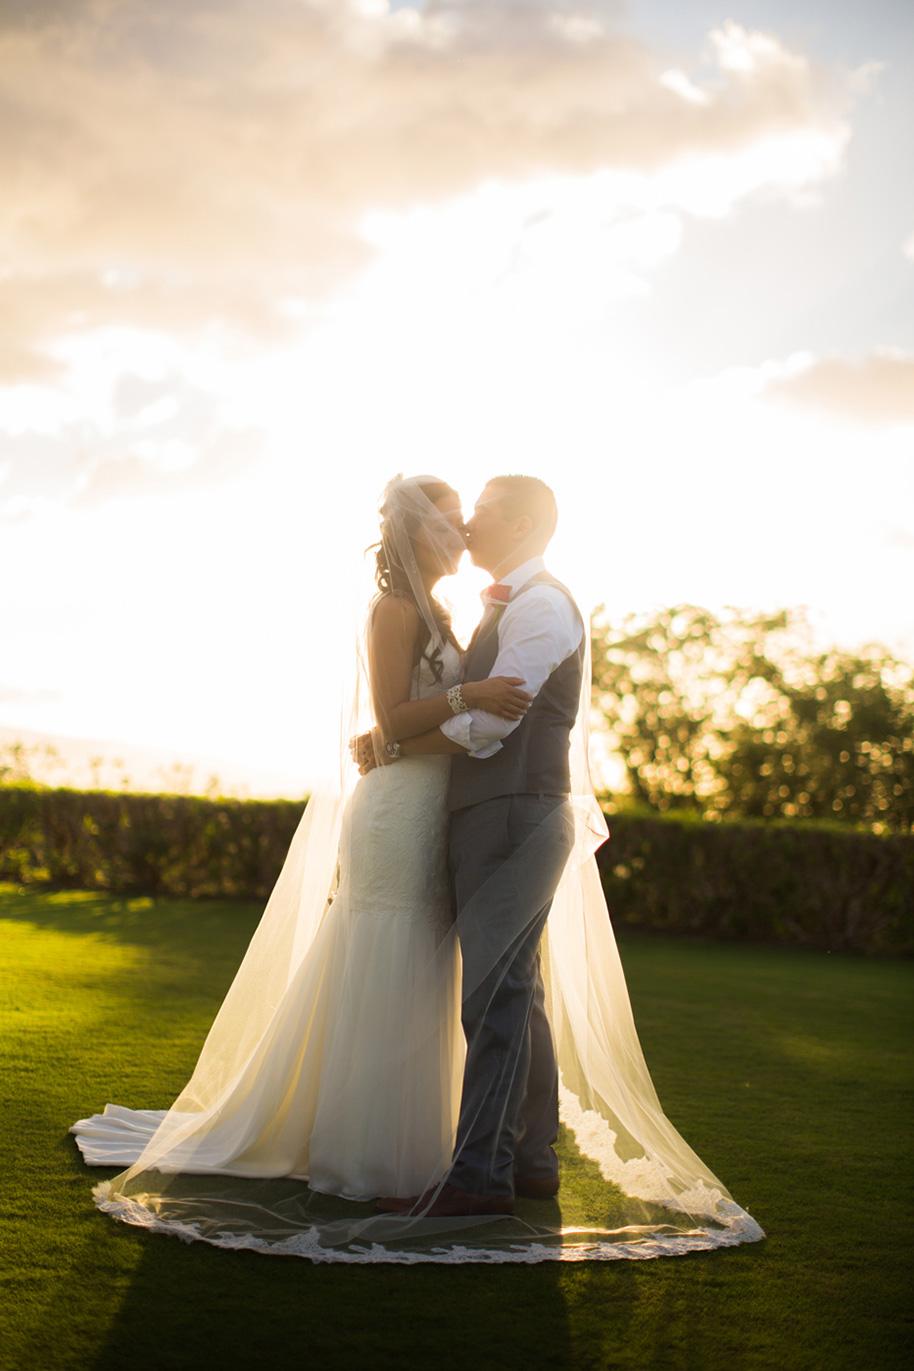 Maui-Beach-Wedding-041216-15